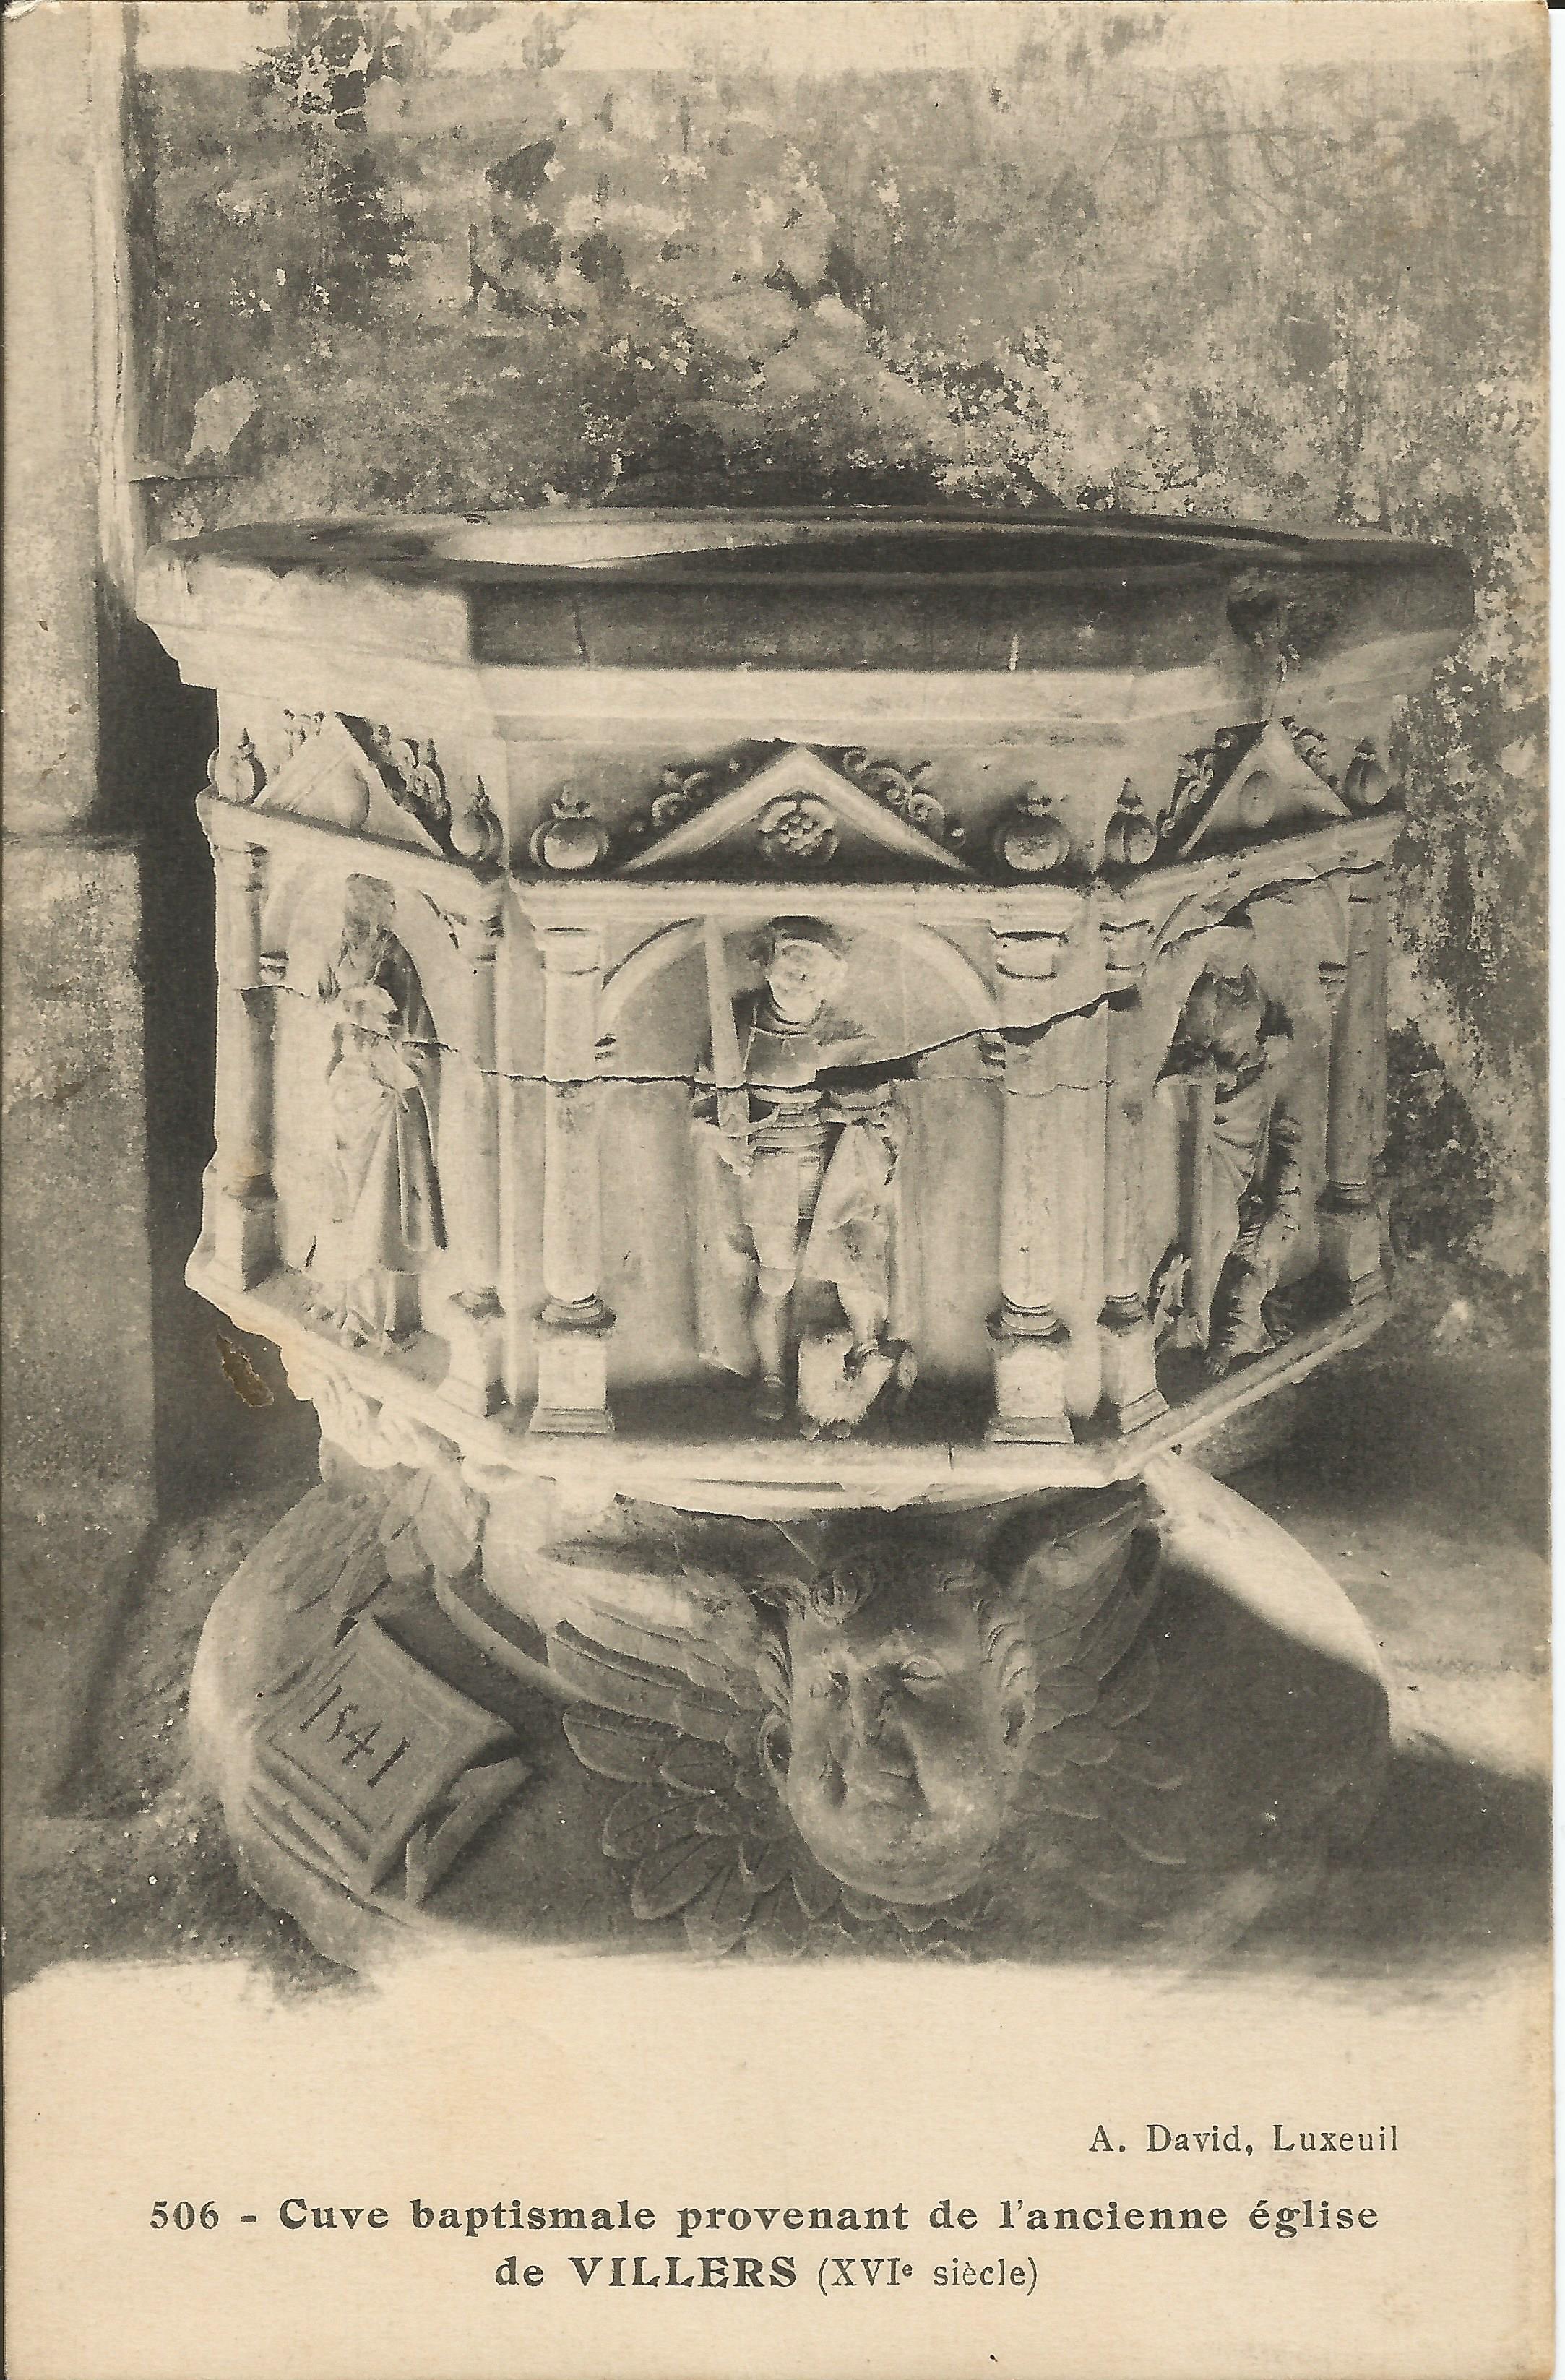 https://www.villers-les-luxeuil.com/projets/villers/files/images/Cartes_postales/Baptistere_2015/Baptistere_1.jpg